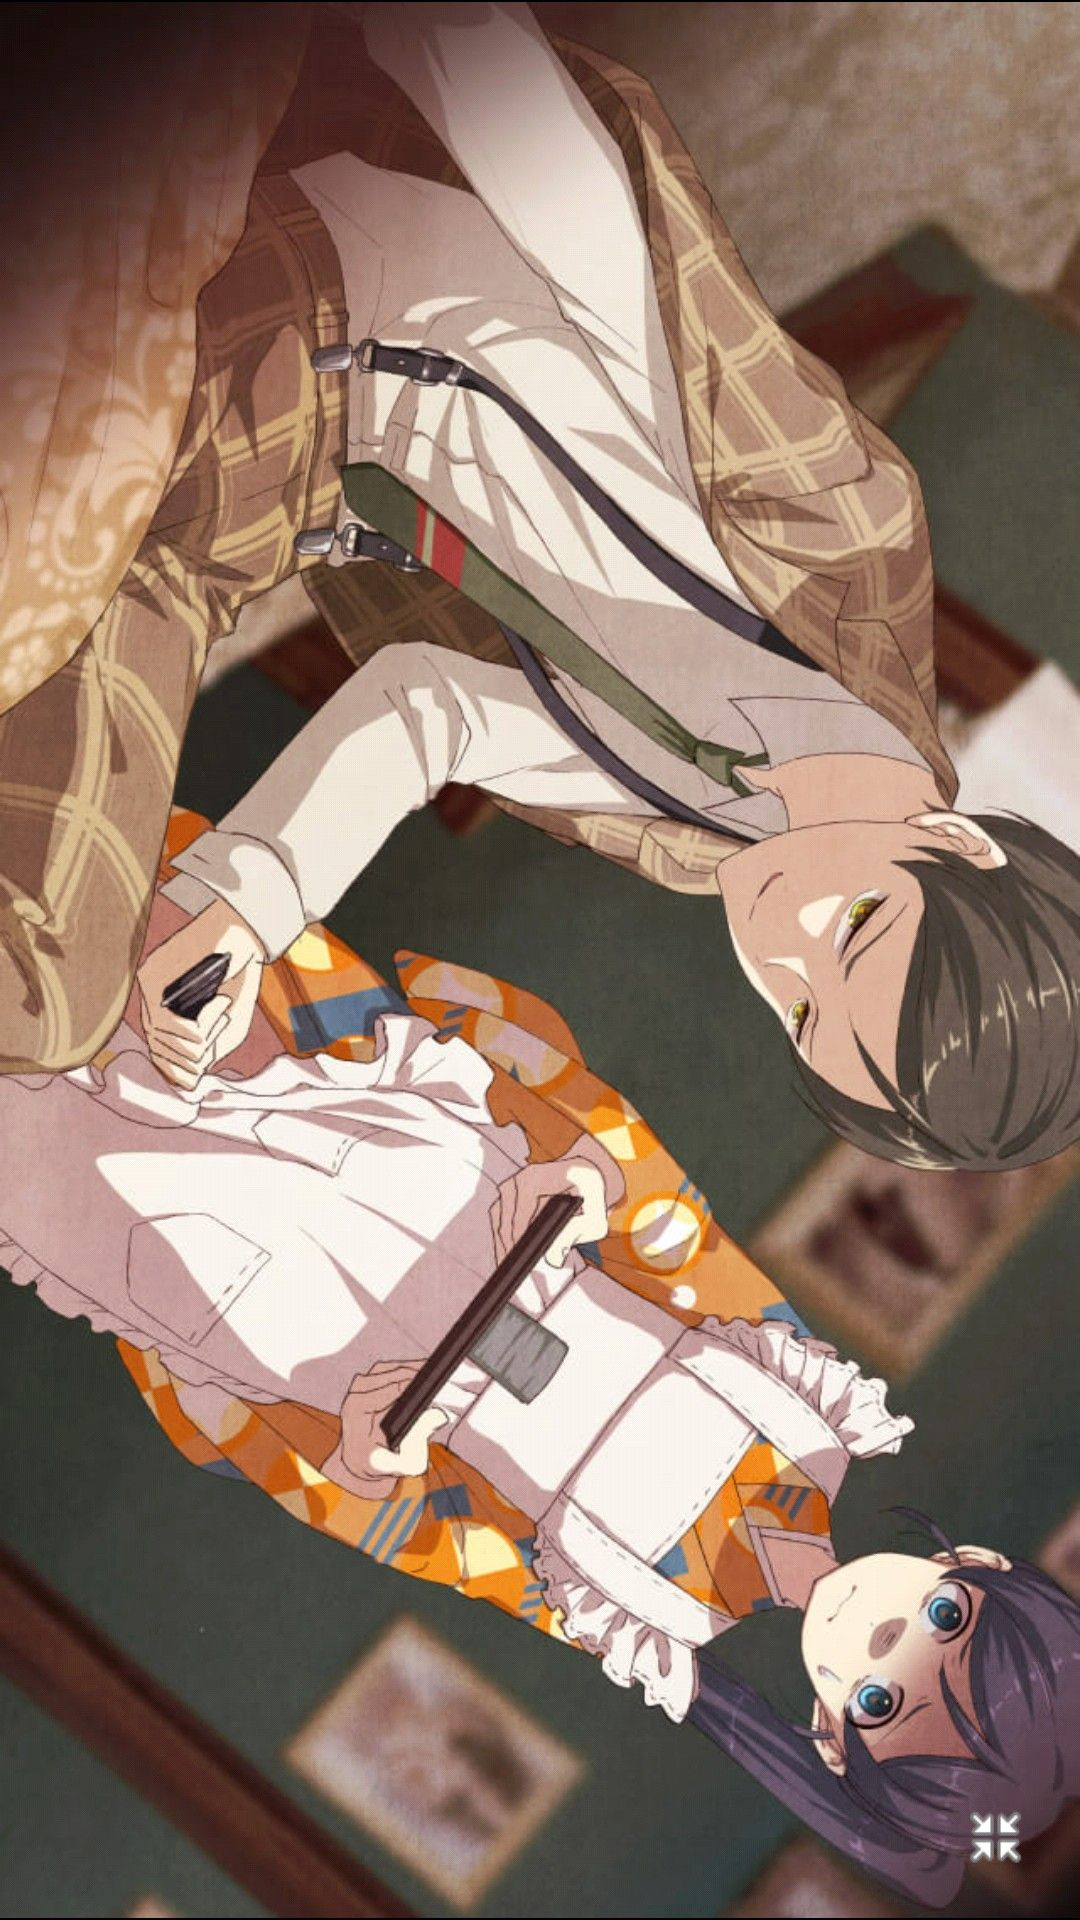 Pin by TalesLana on ゲーム・マンガ(色々) Hotel games, Anime, Dark